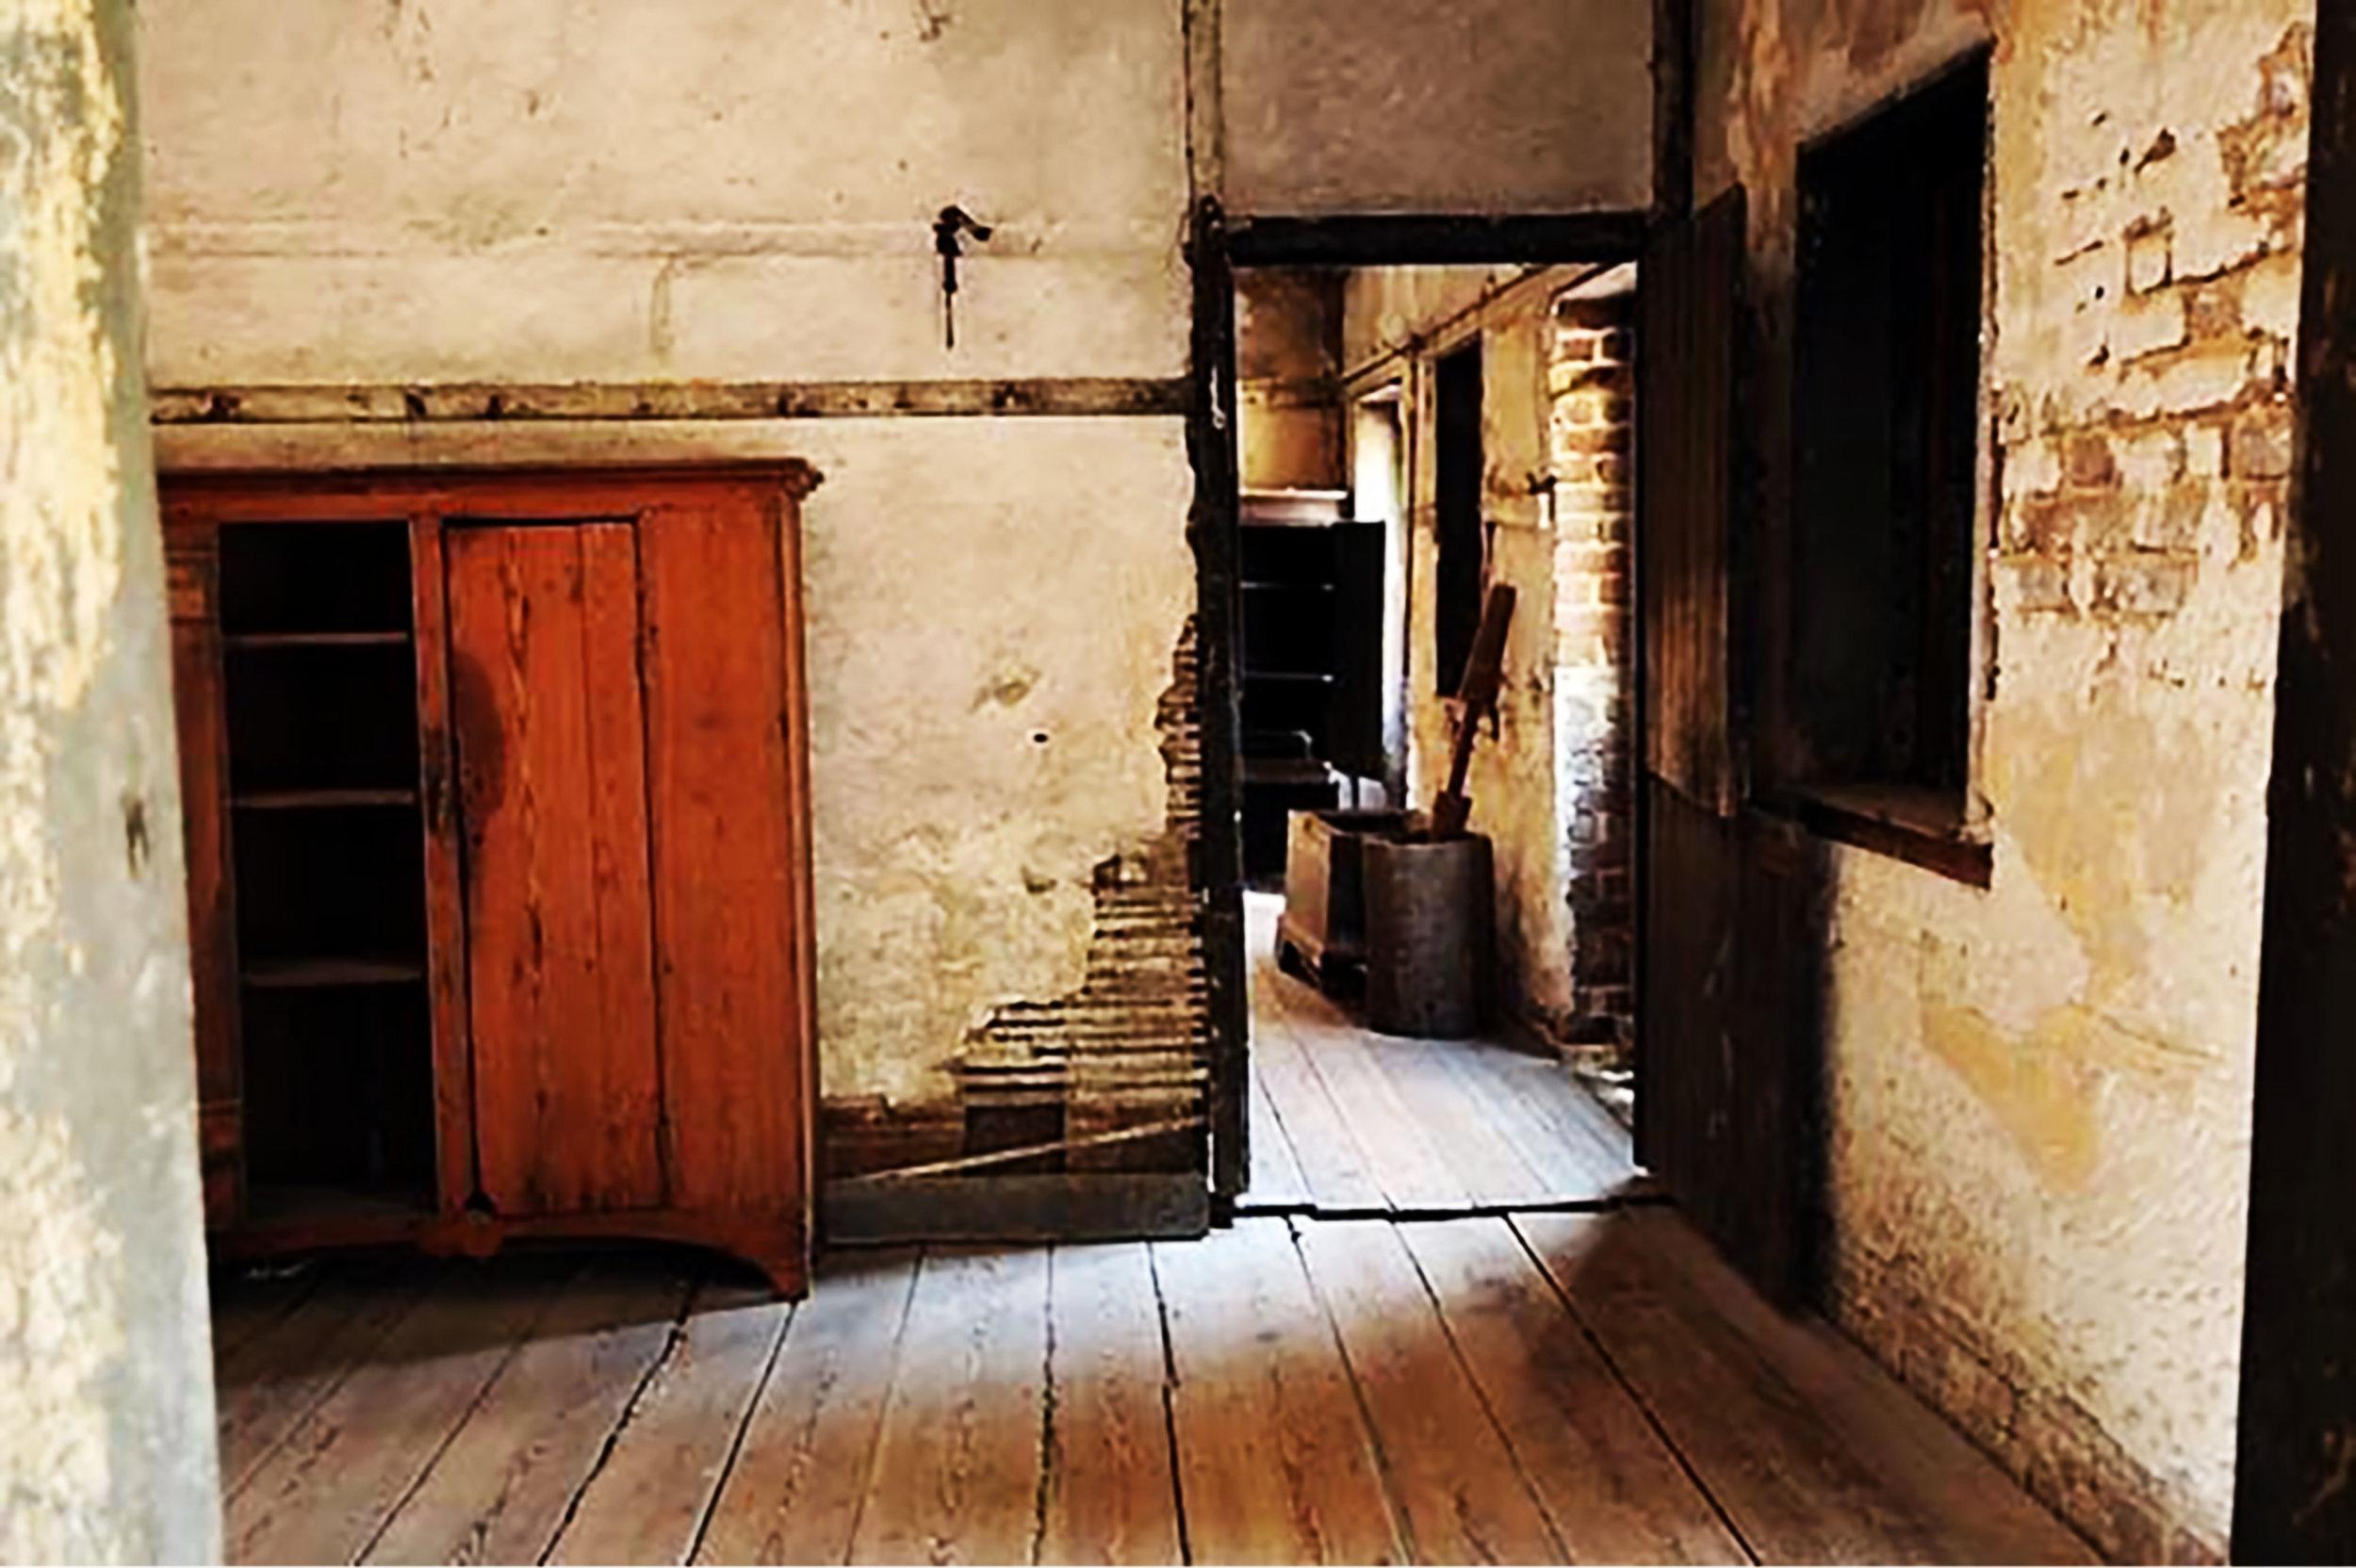 Interior of slave quarters warming kitchen on the first floor of the Aiken Rhett property